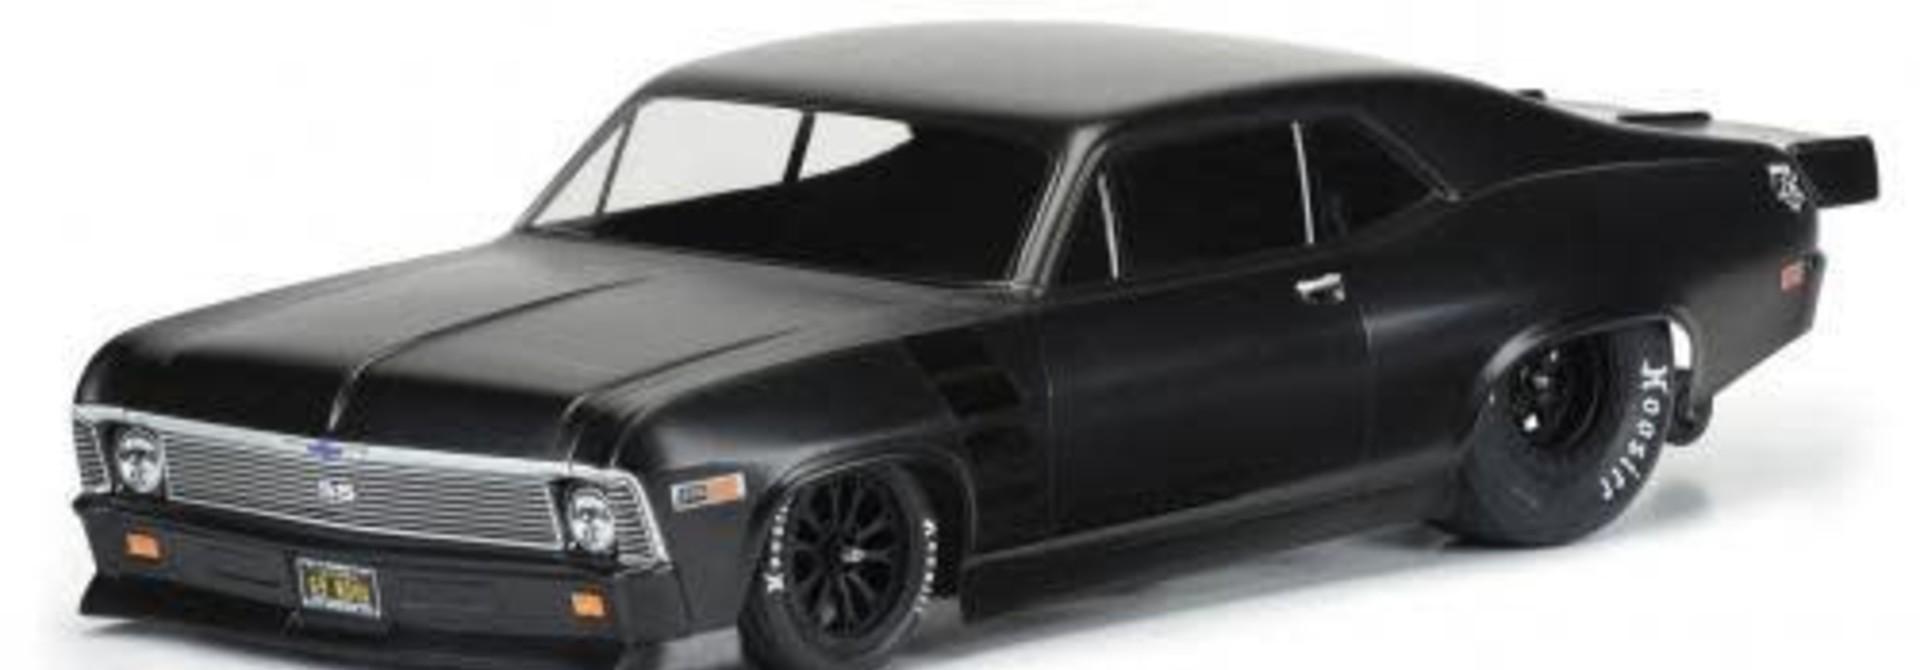 1969 Chevrolet Nova Clear Body Slash 2wd Drag Car